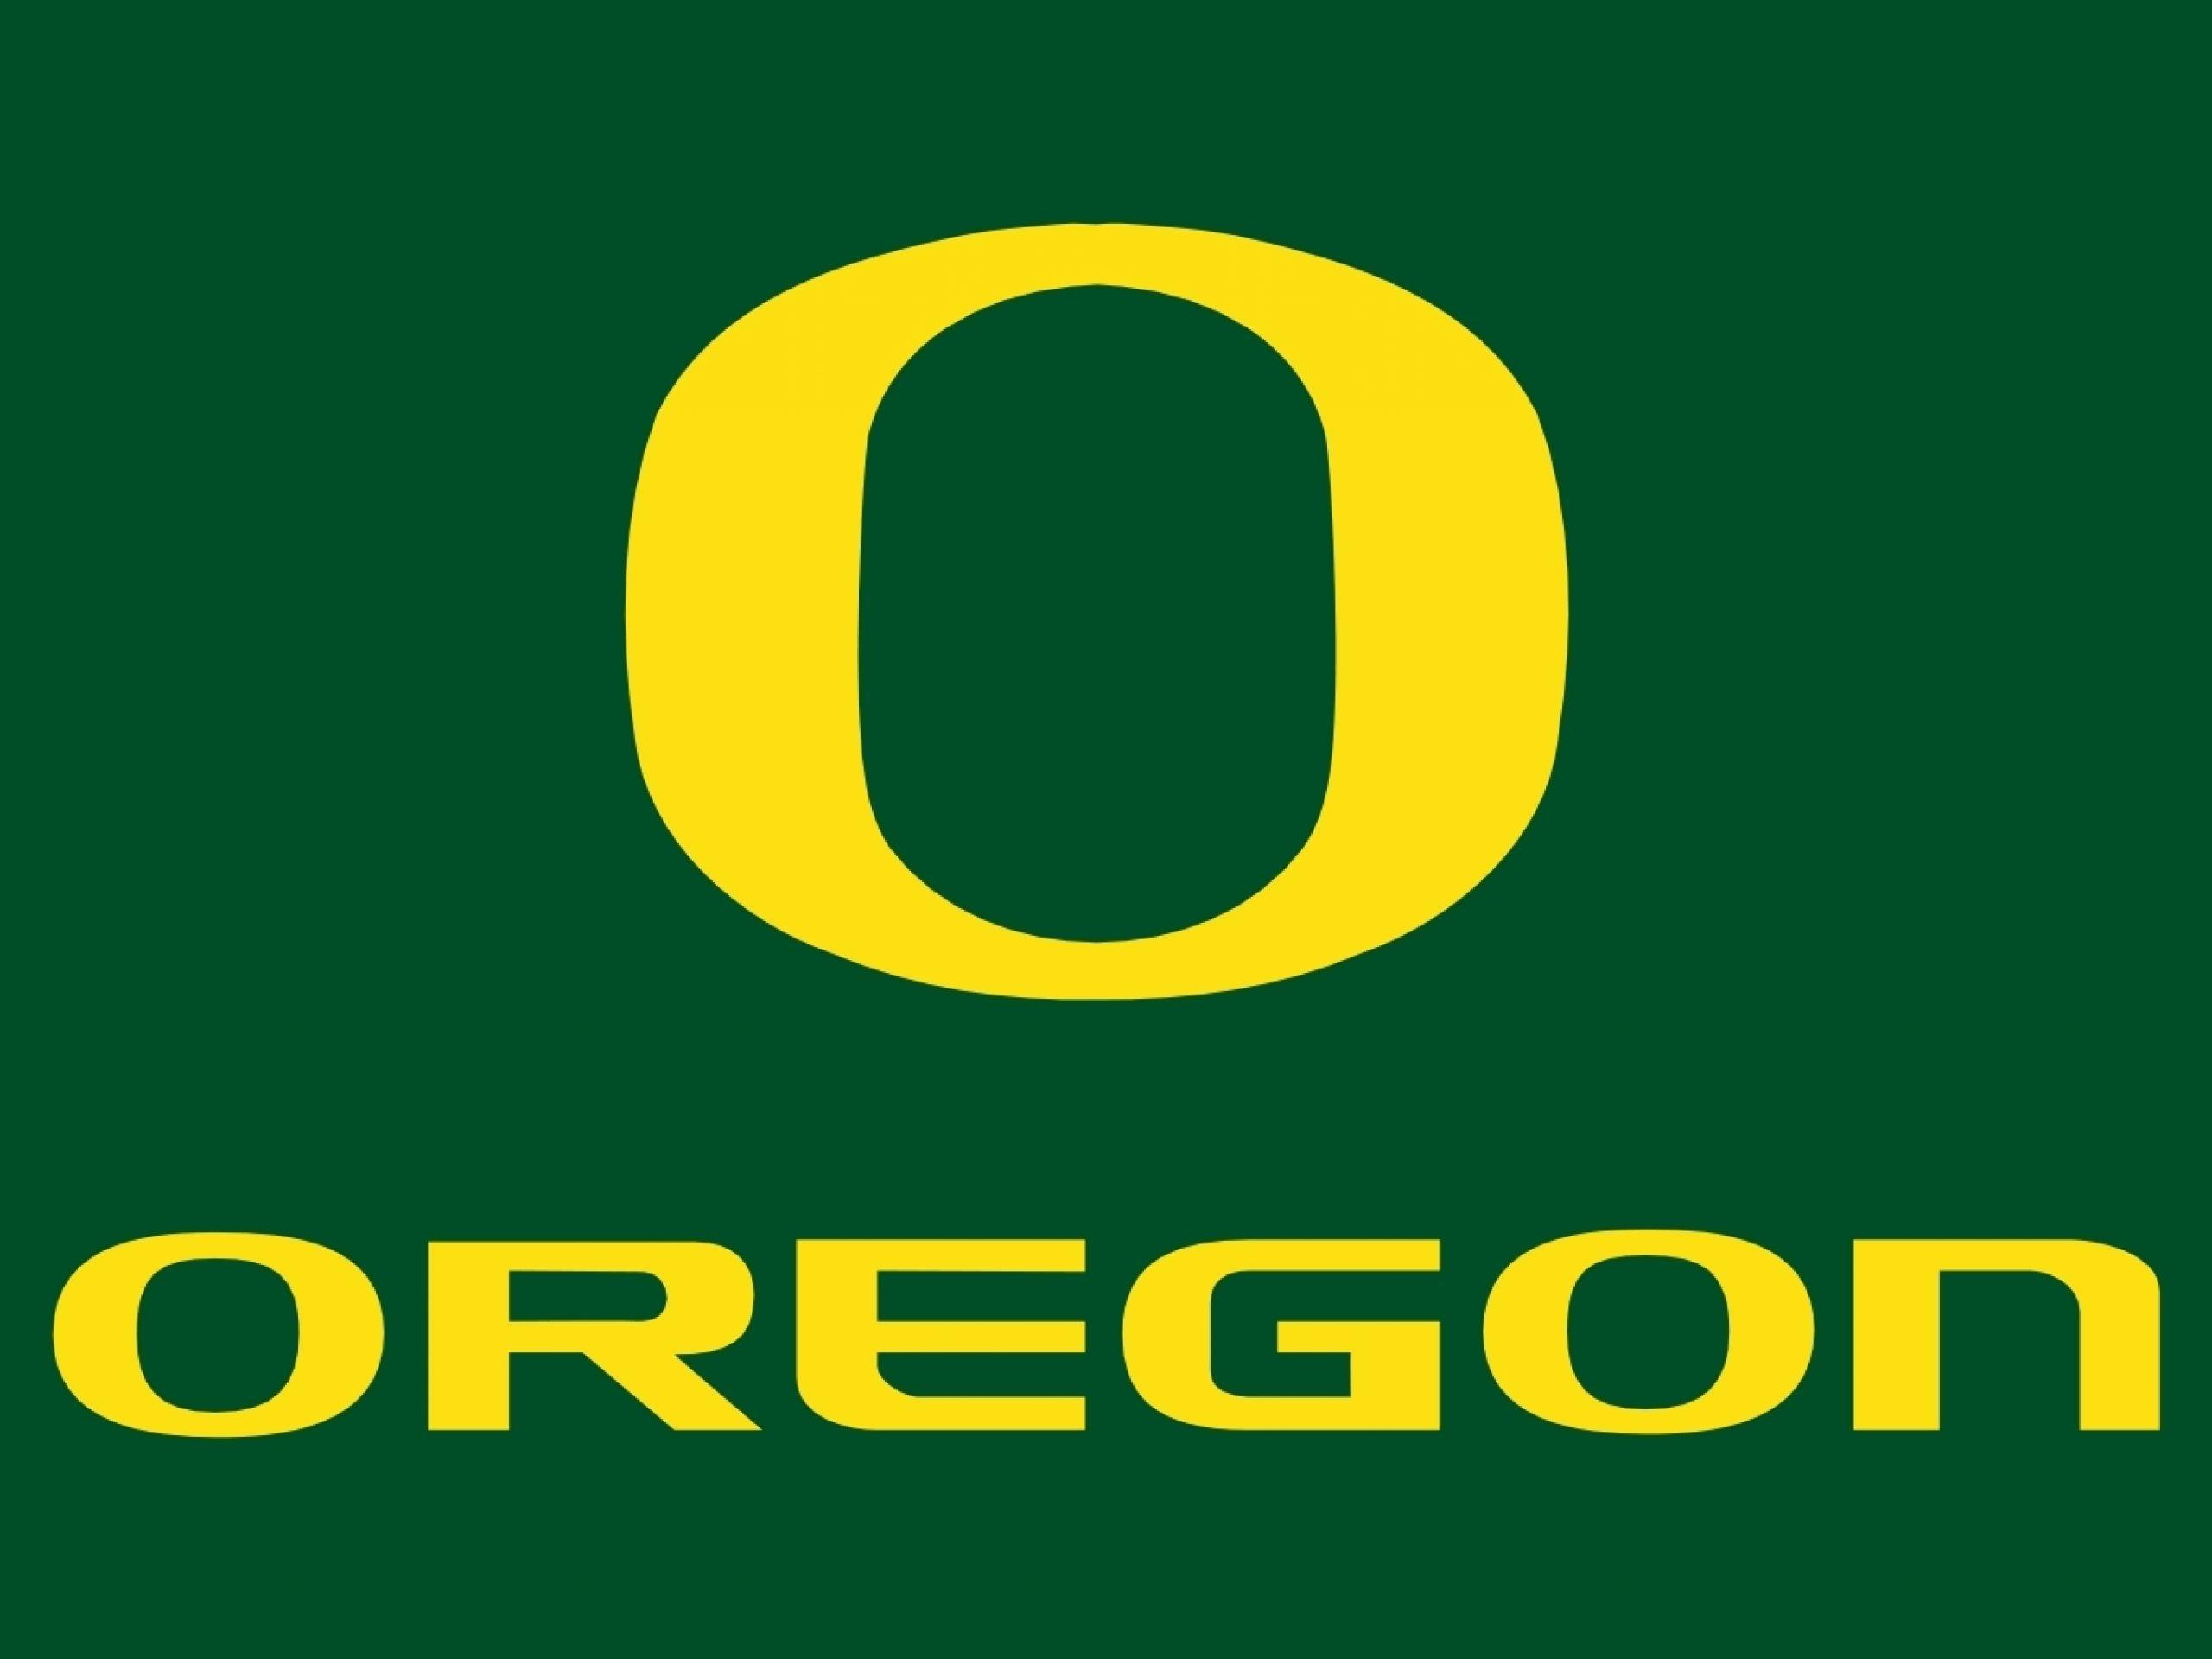 Oregon Ducks 1365x1024 Wallpaper Oregon Ducks Logo Oregon Ducks University Of Oregon